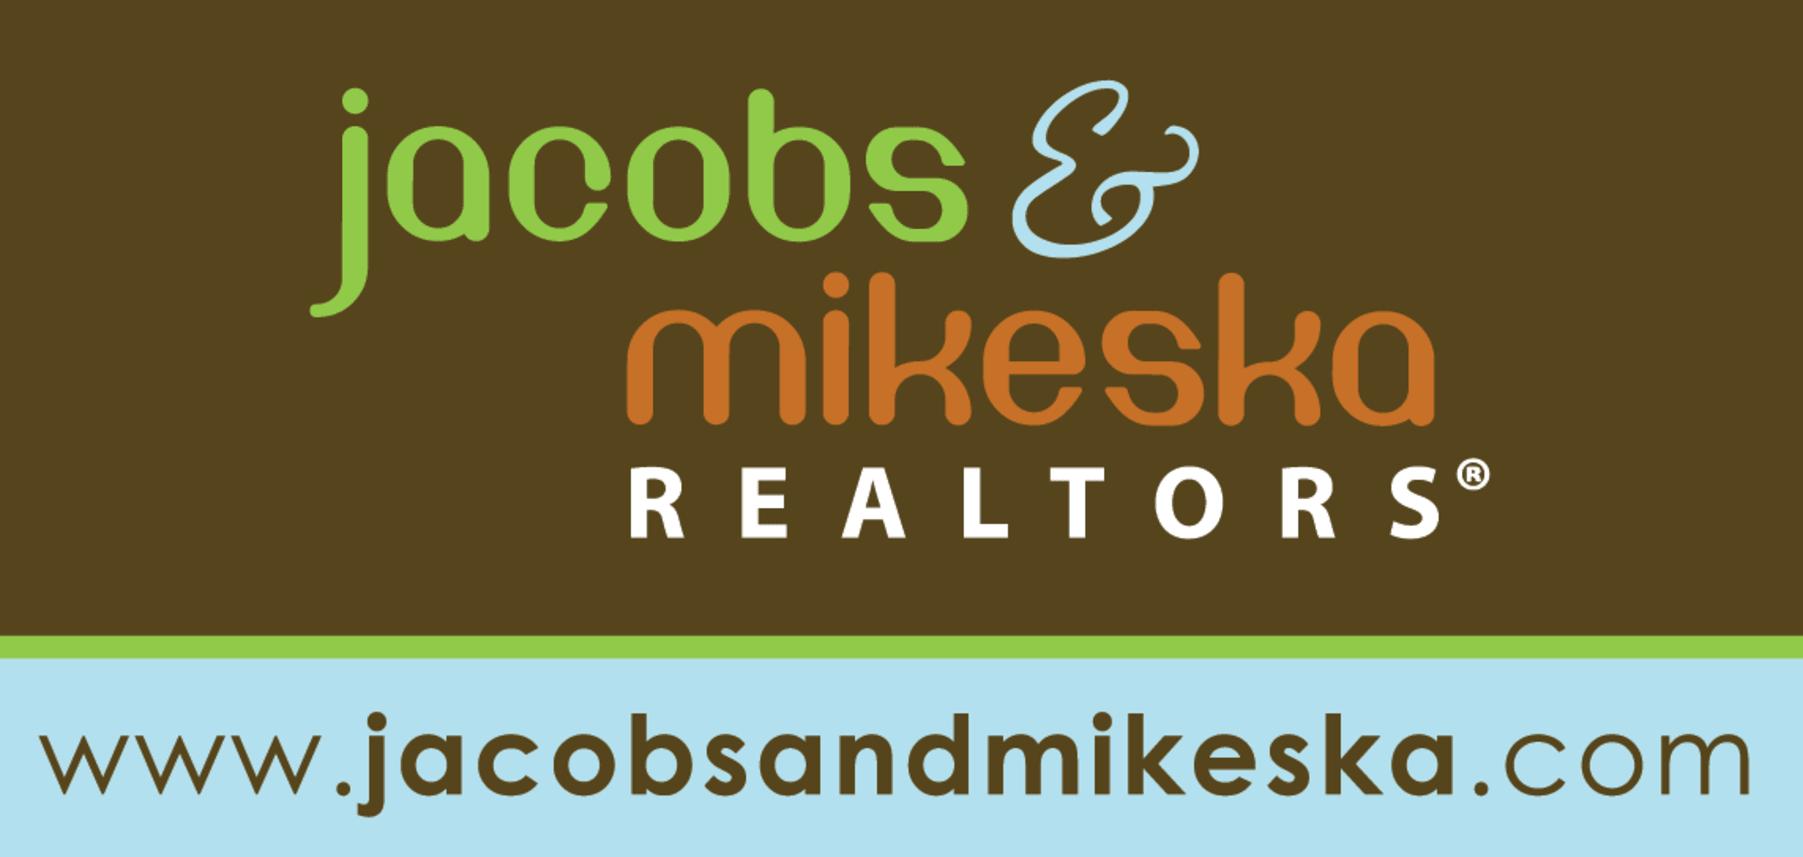 Listings Search - Jacobs & Mikeska Realtors